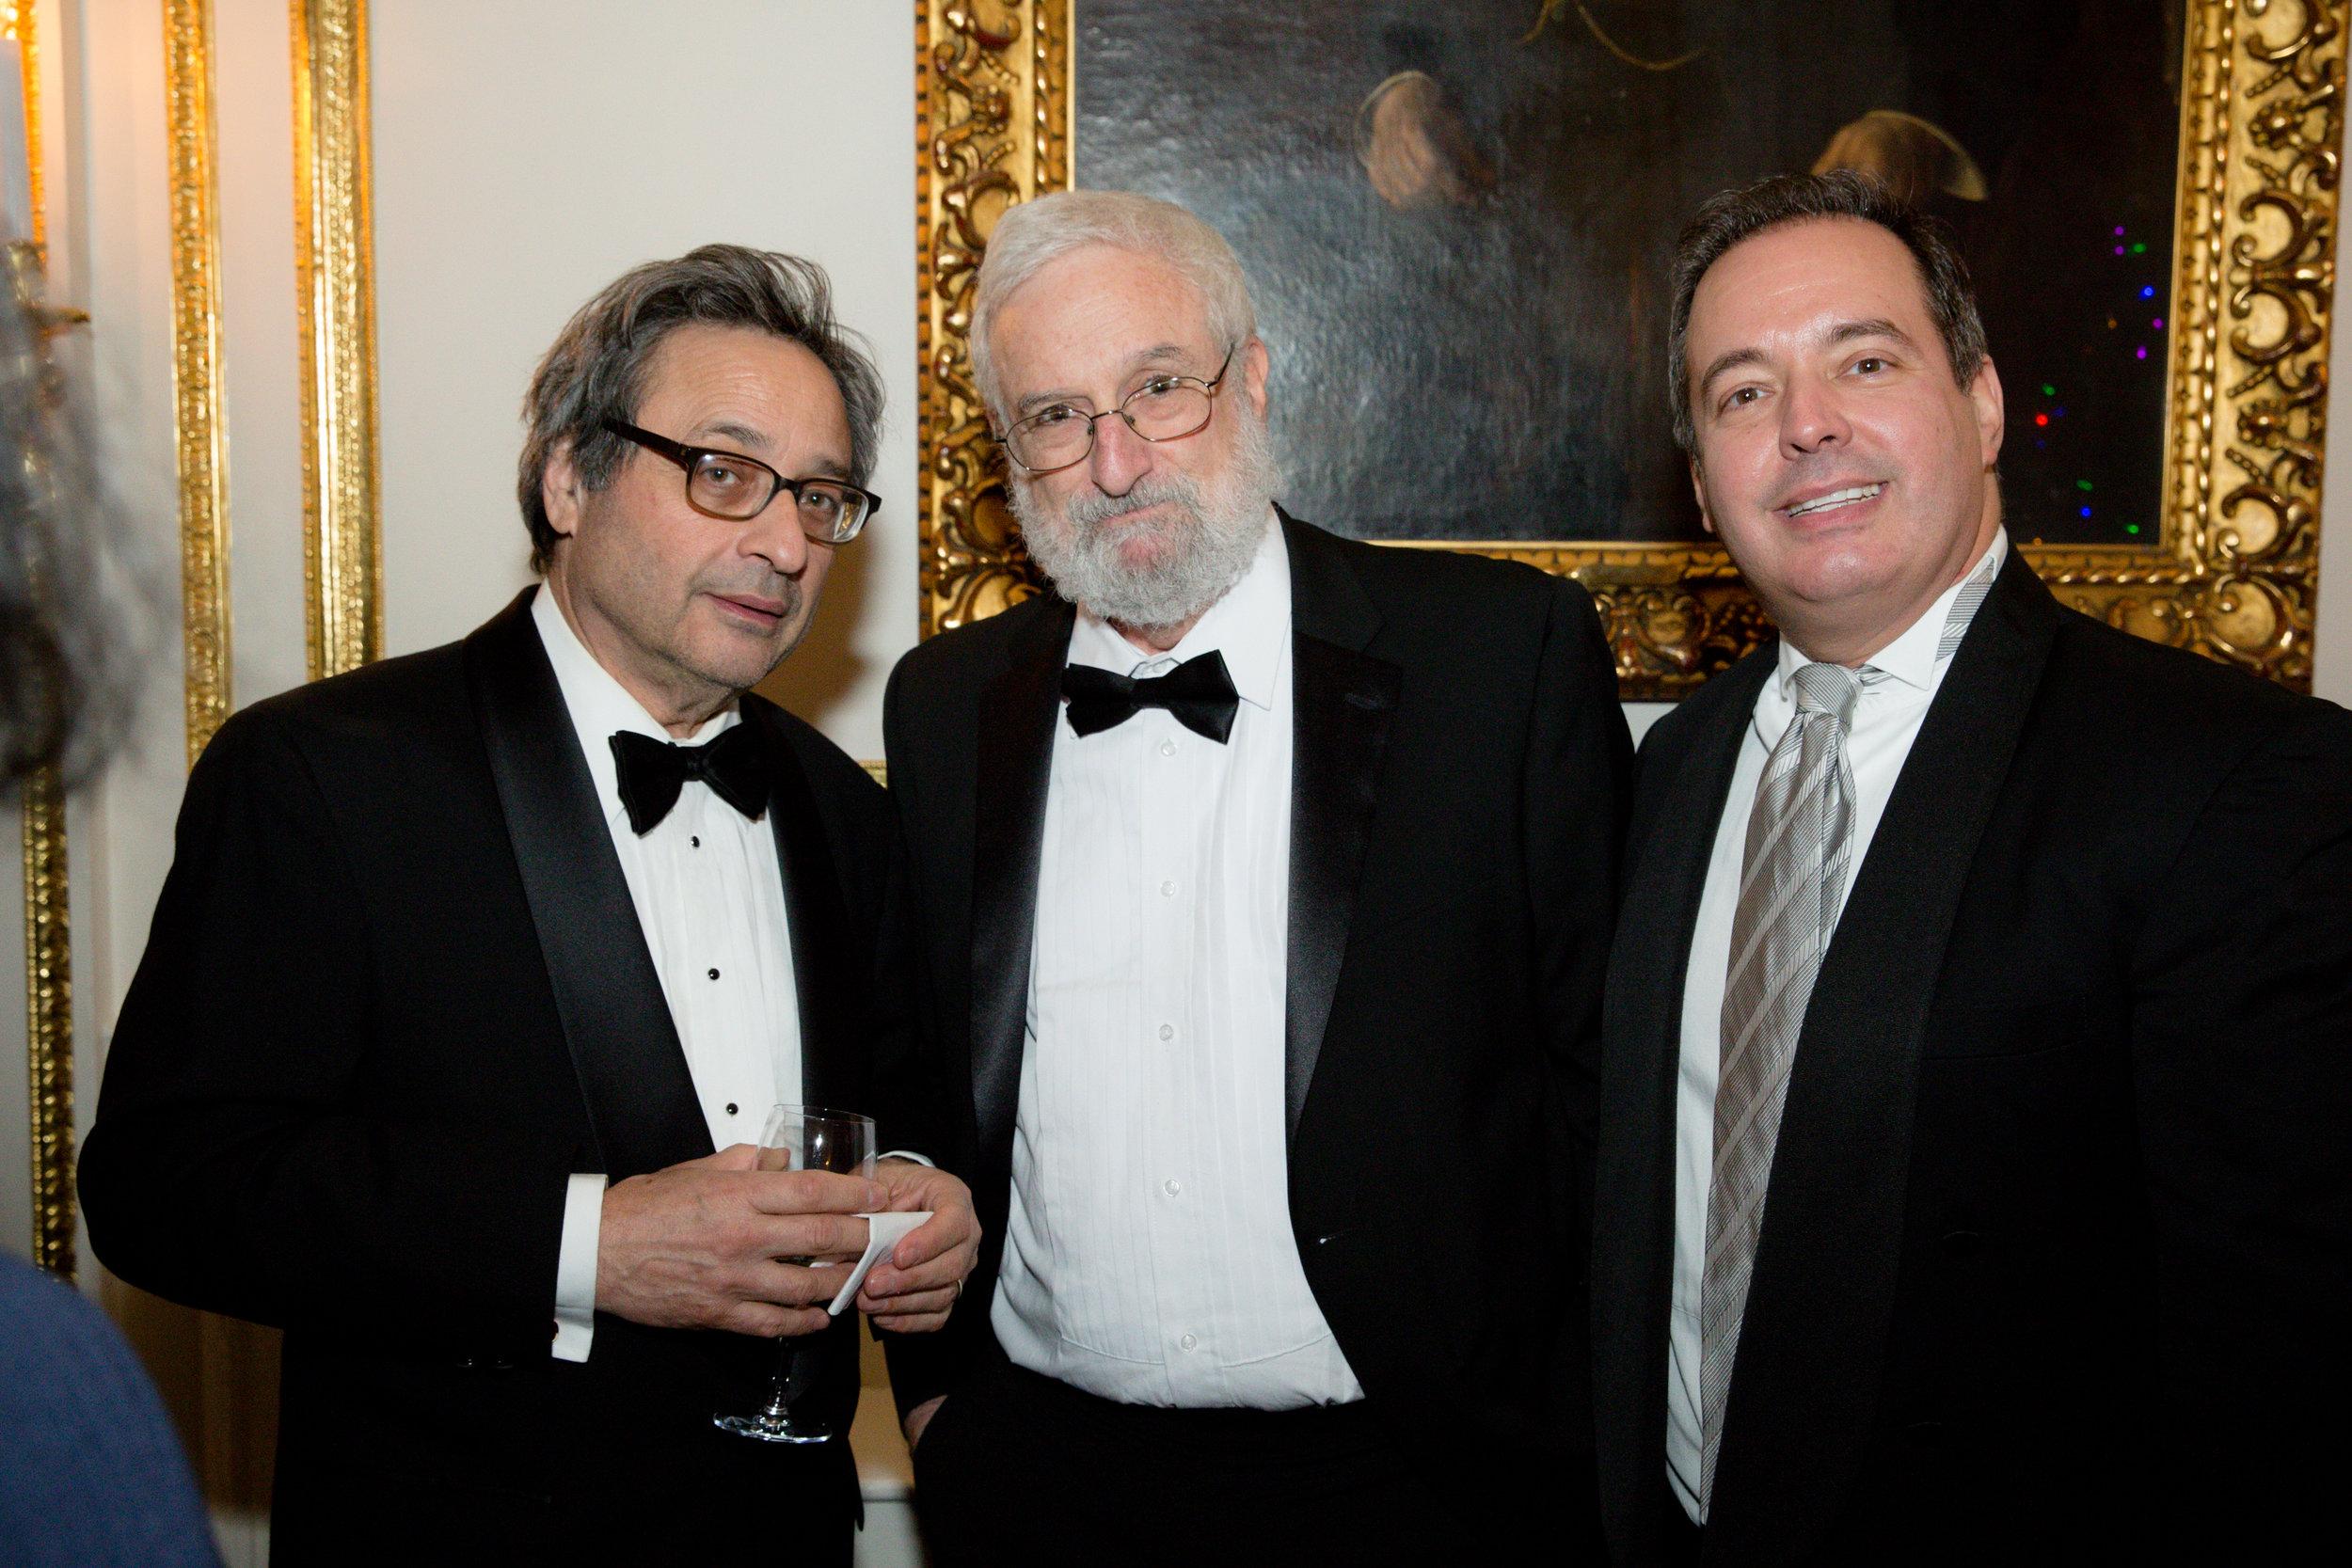 Andrew Delbanco, James Grossman, Carlos Diaz-Castillo